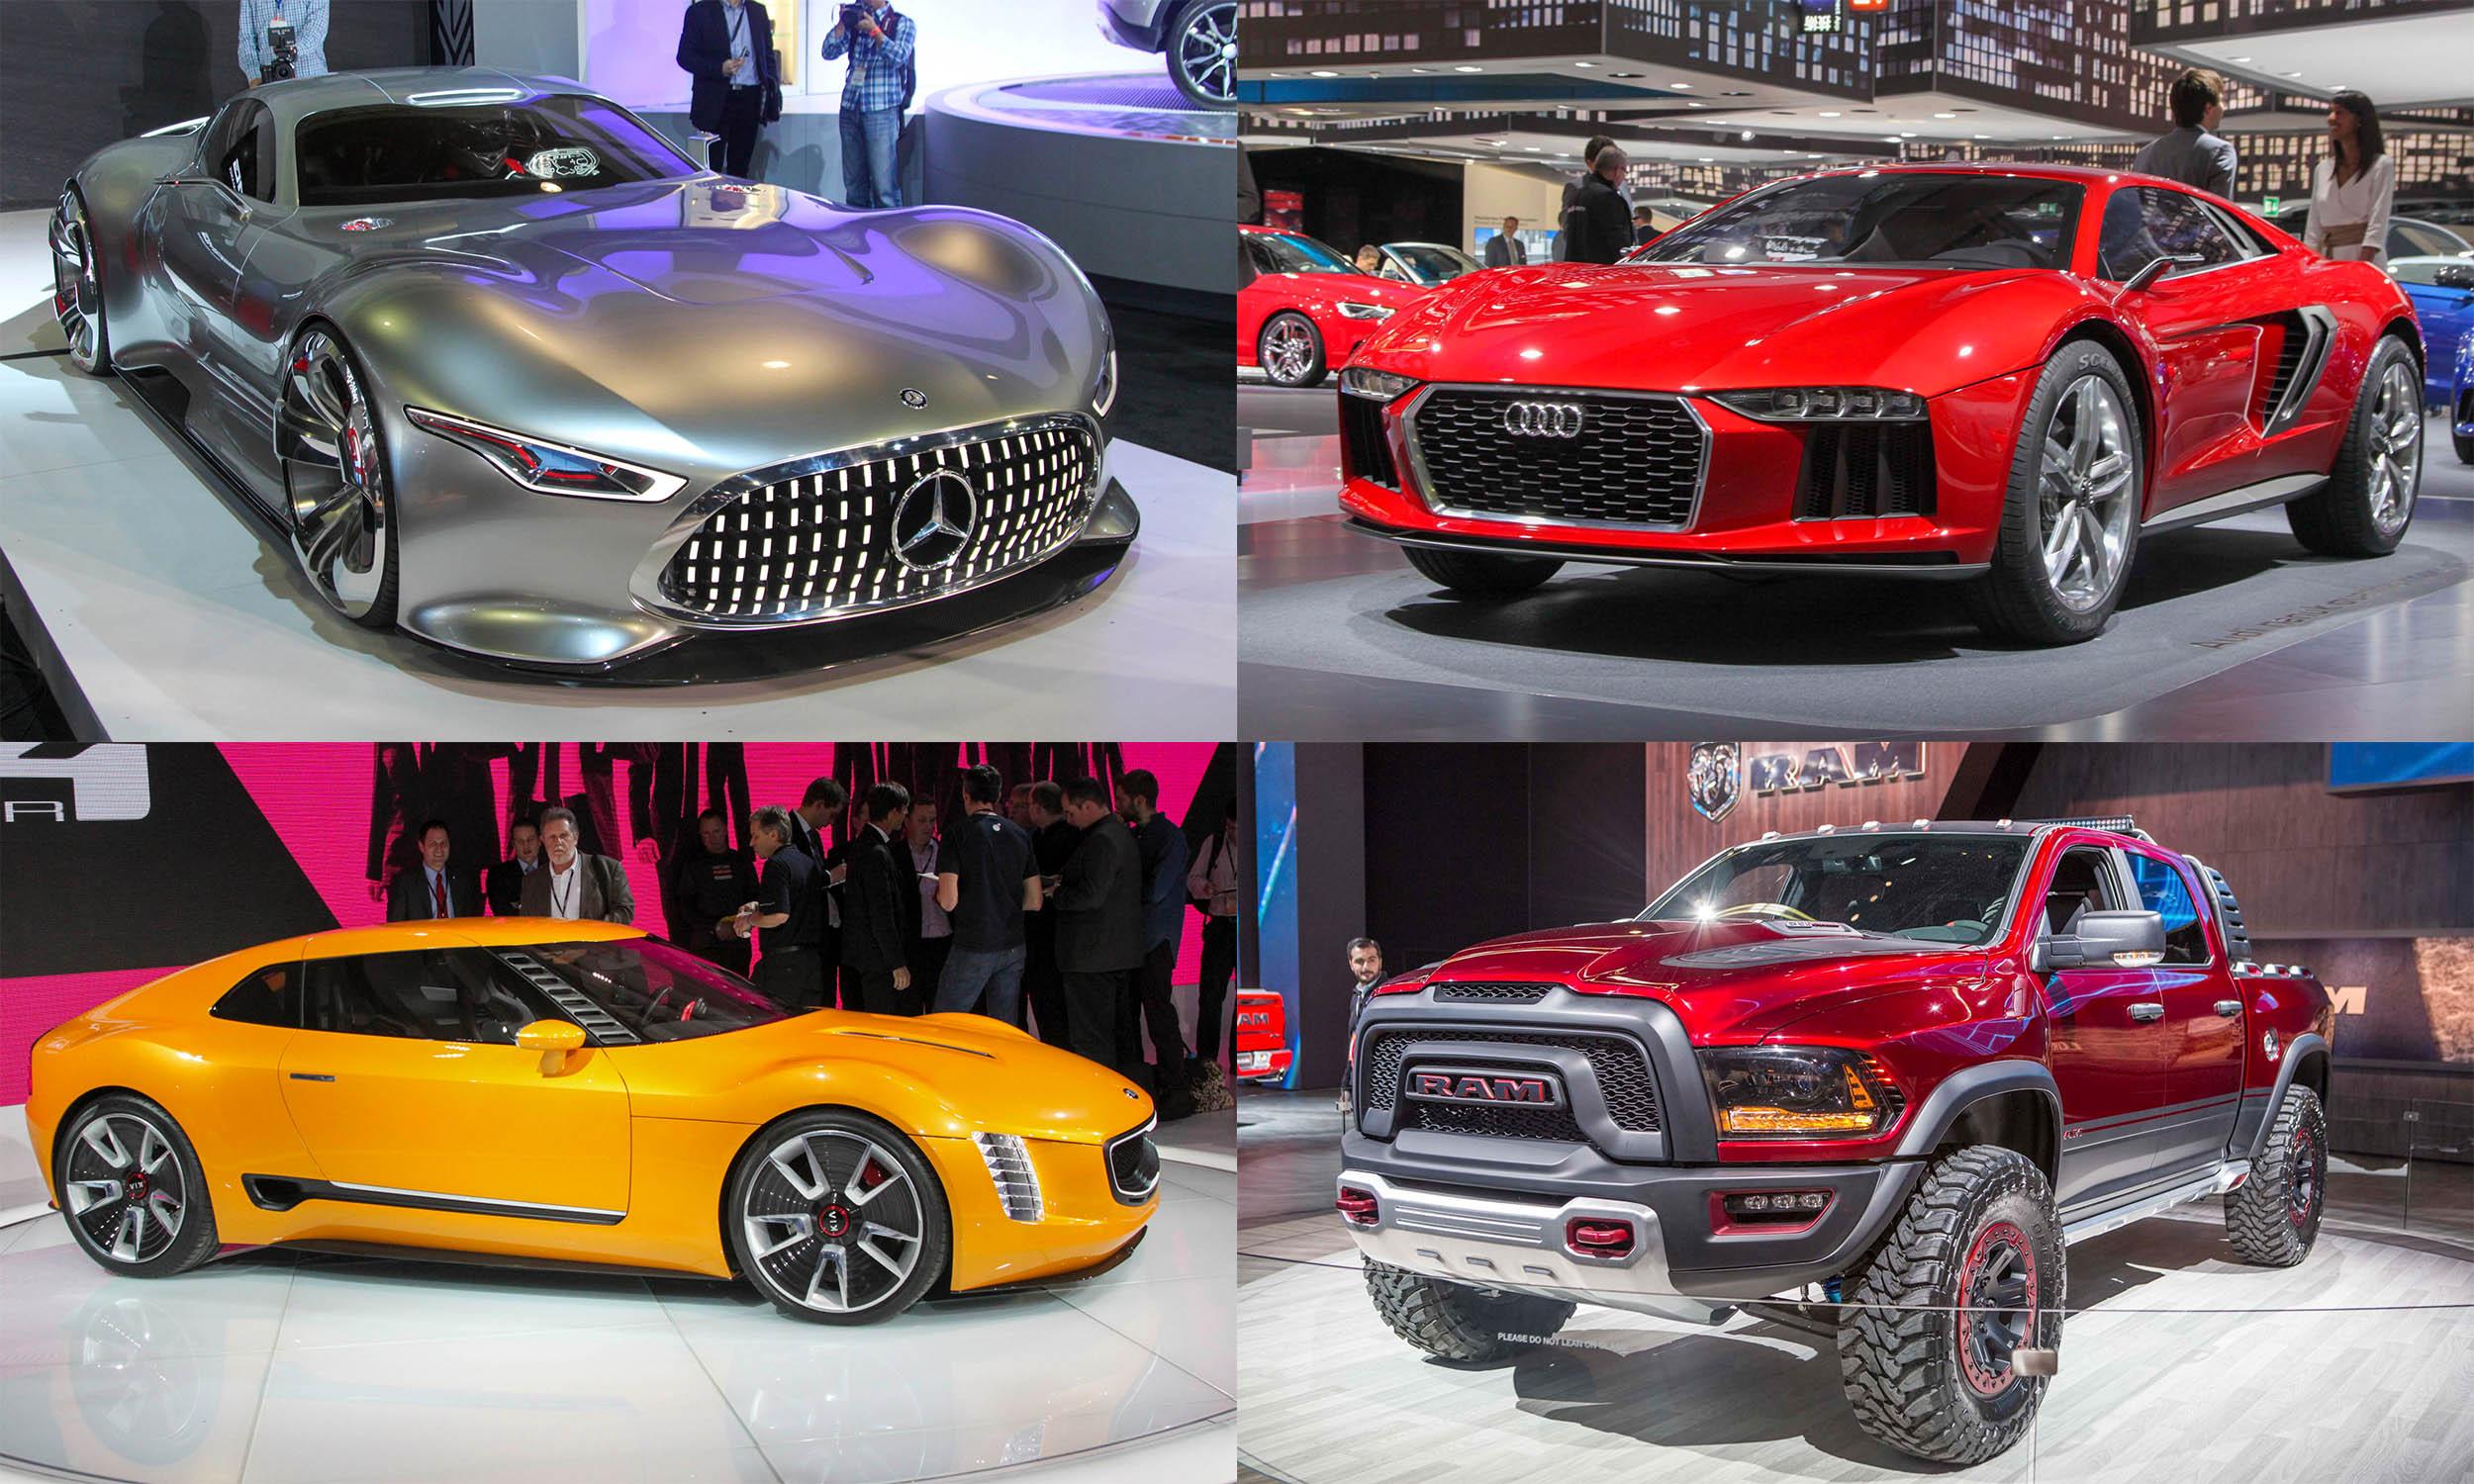 © Automotive Content Experience